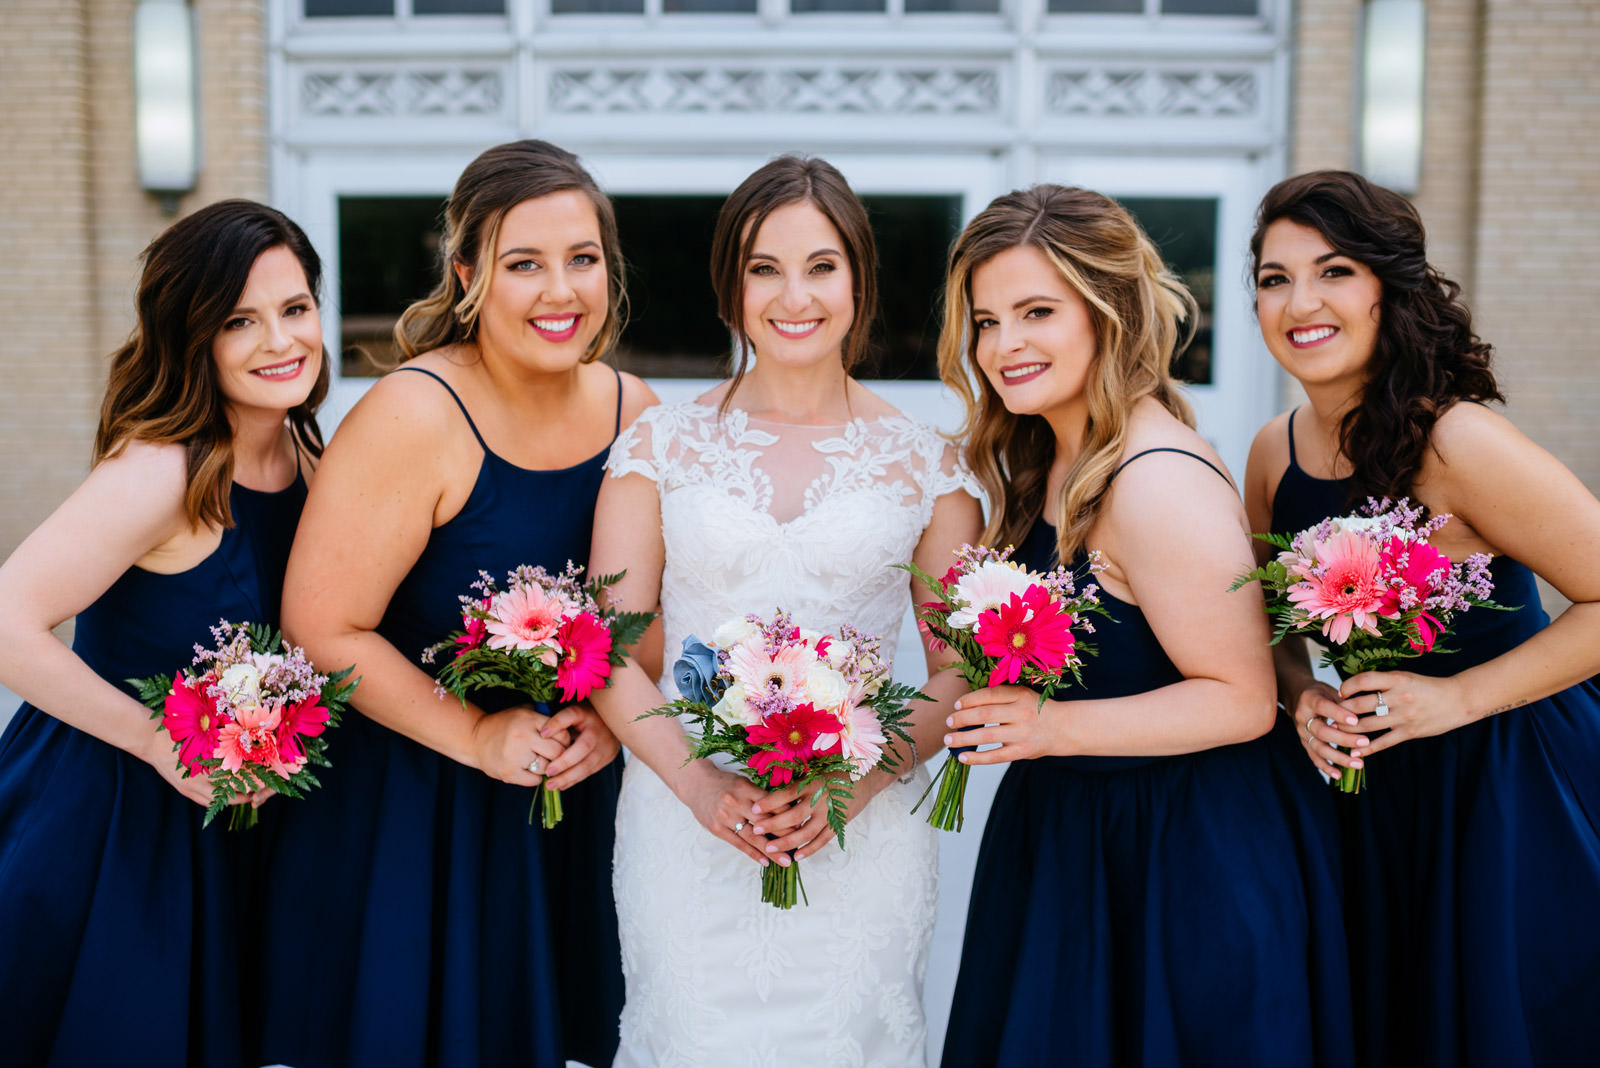 bridesmaids at uc university of charleston